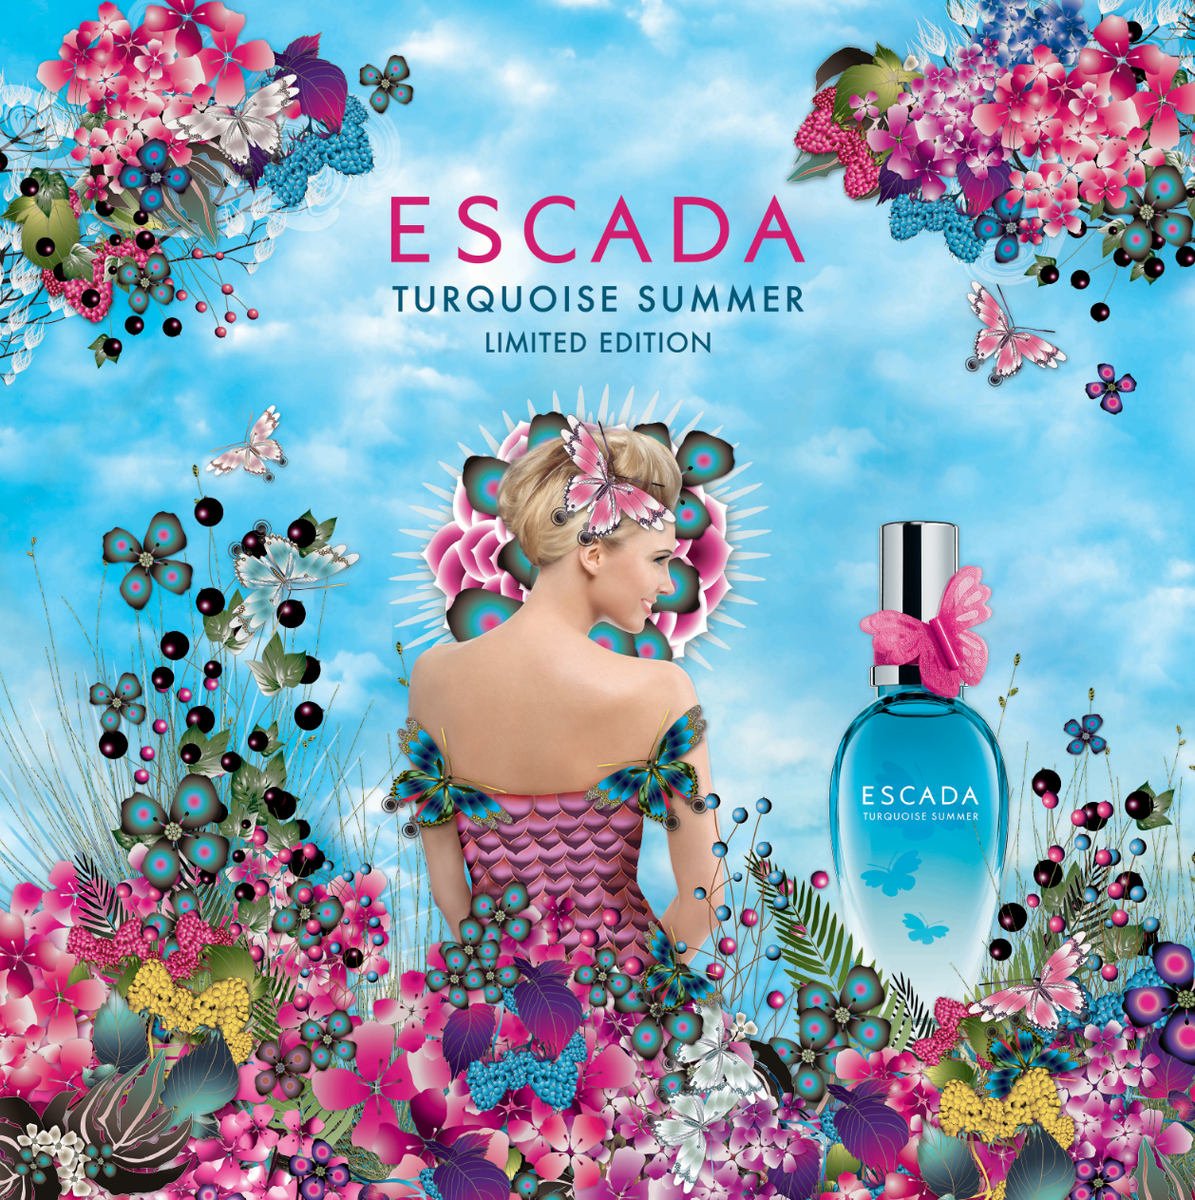 Dive into the world of our new Summer Fragrance ESCADA #TurquoiseSummer http://t.co/rfkAW4ofAr http://t.co/J34zV9P40W